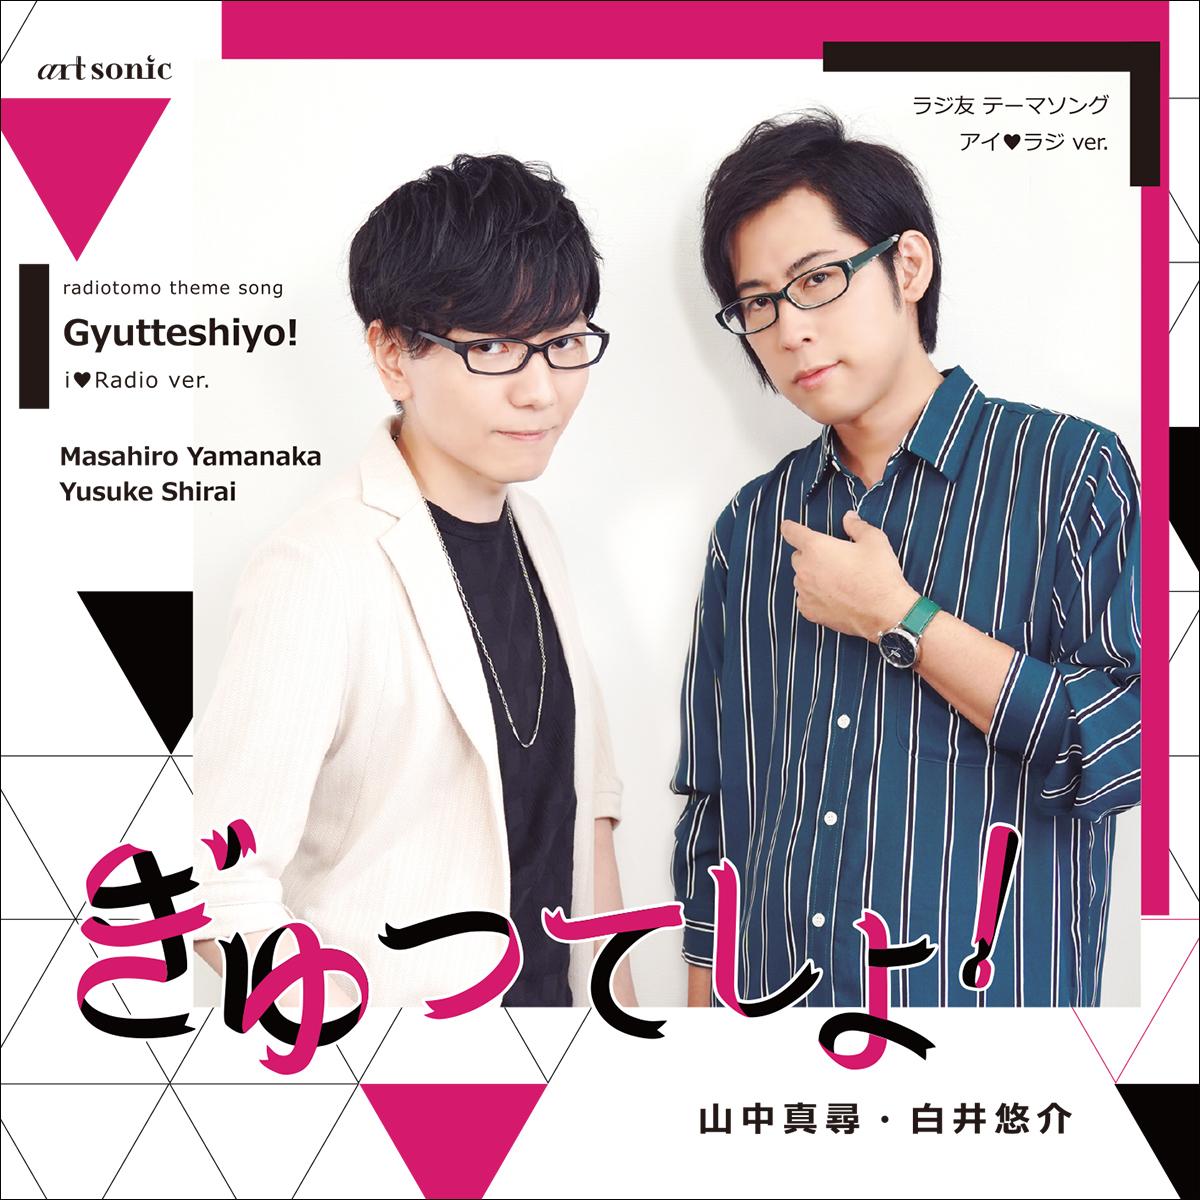 radiotomo theme song Gyutteshiyo! 1♡Radio ver. ラジ友テーマソング『ぎゅってしよ!』アイラジ ver.